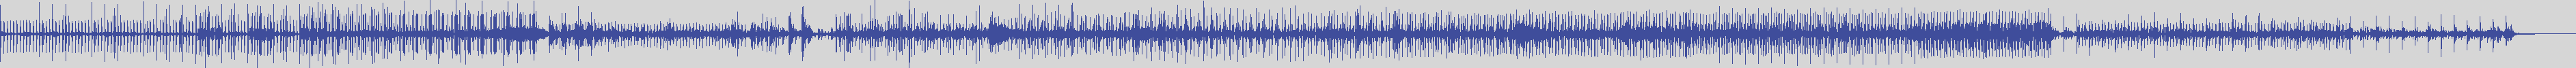 just_digital_records [JS1186] Malden - Antille [Original Mix] audio wave form